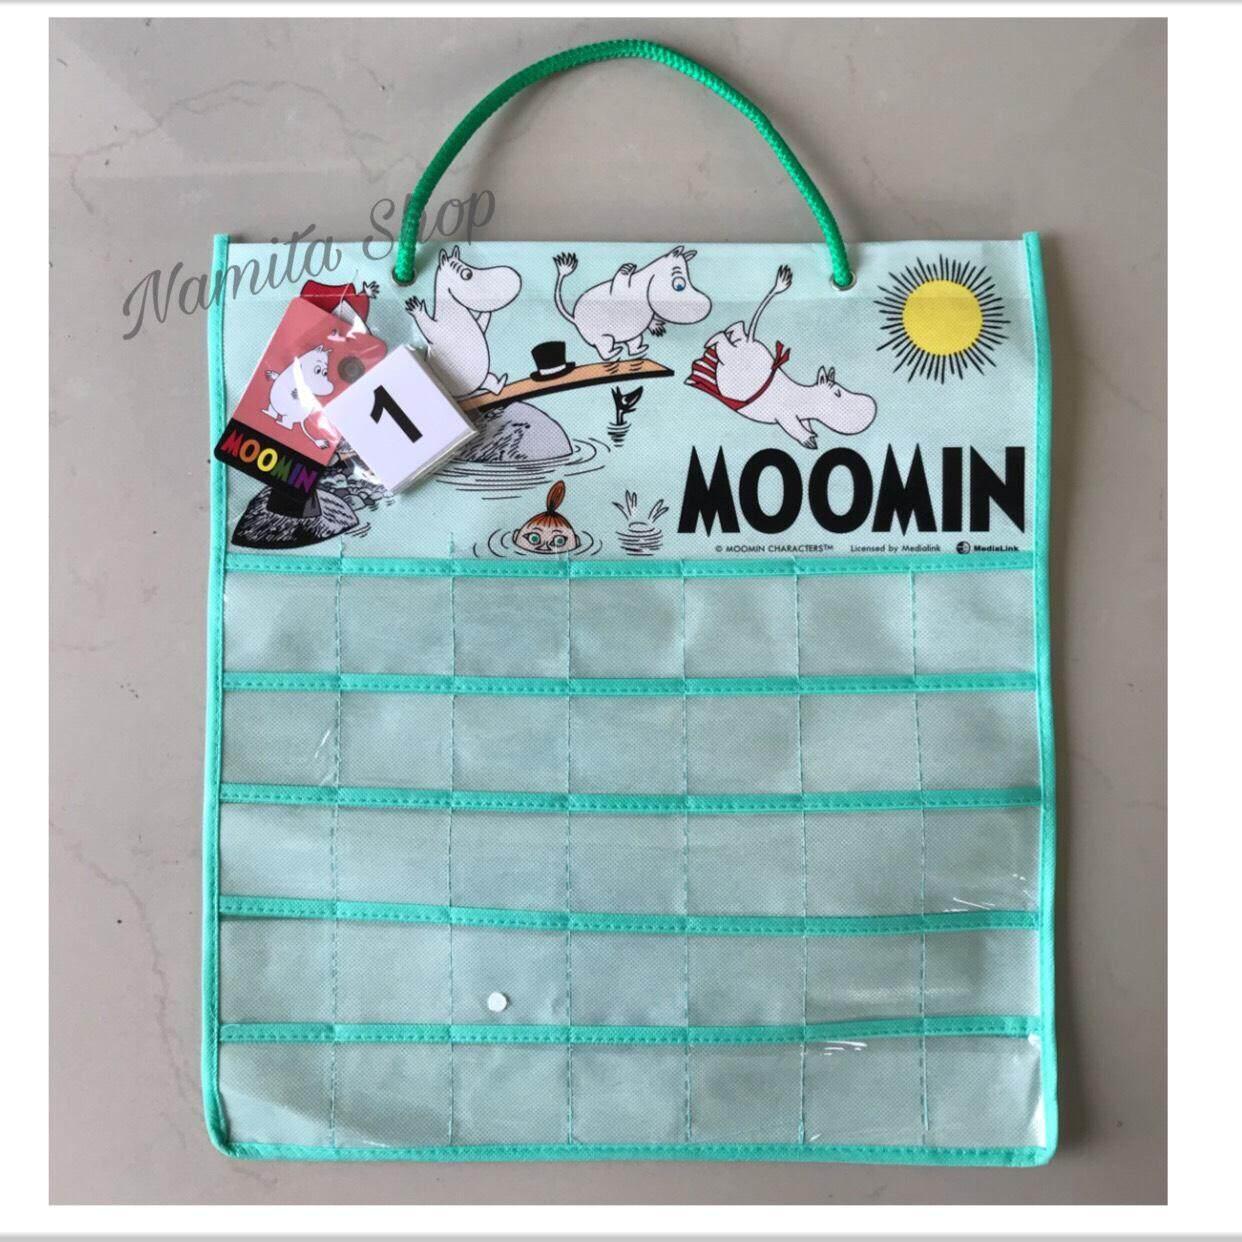 Moomin กระเป๋าแขวนผนัง 35 ช่อง ปฏิทินออมเงิน ลายมูมิน ขนาด กว้าง 40x ยาว 44ซม..